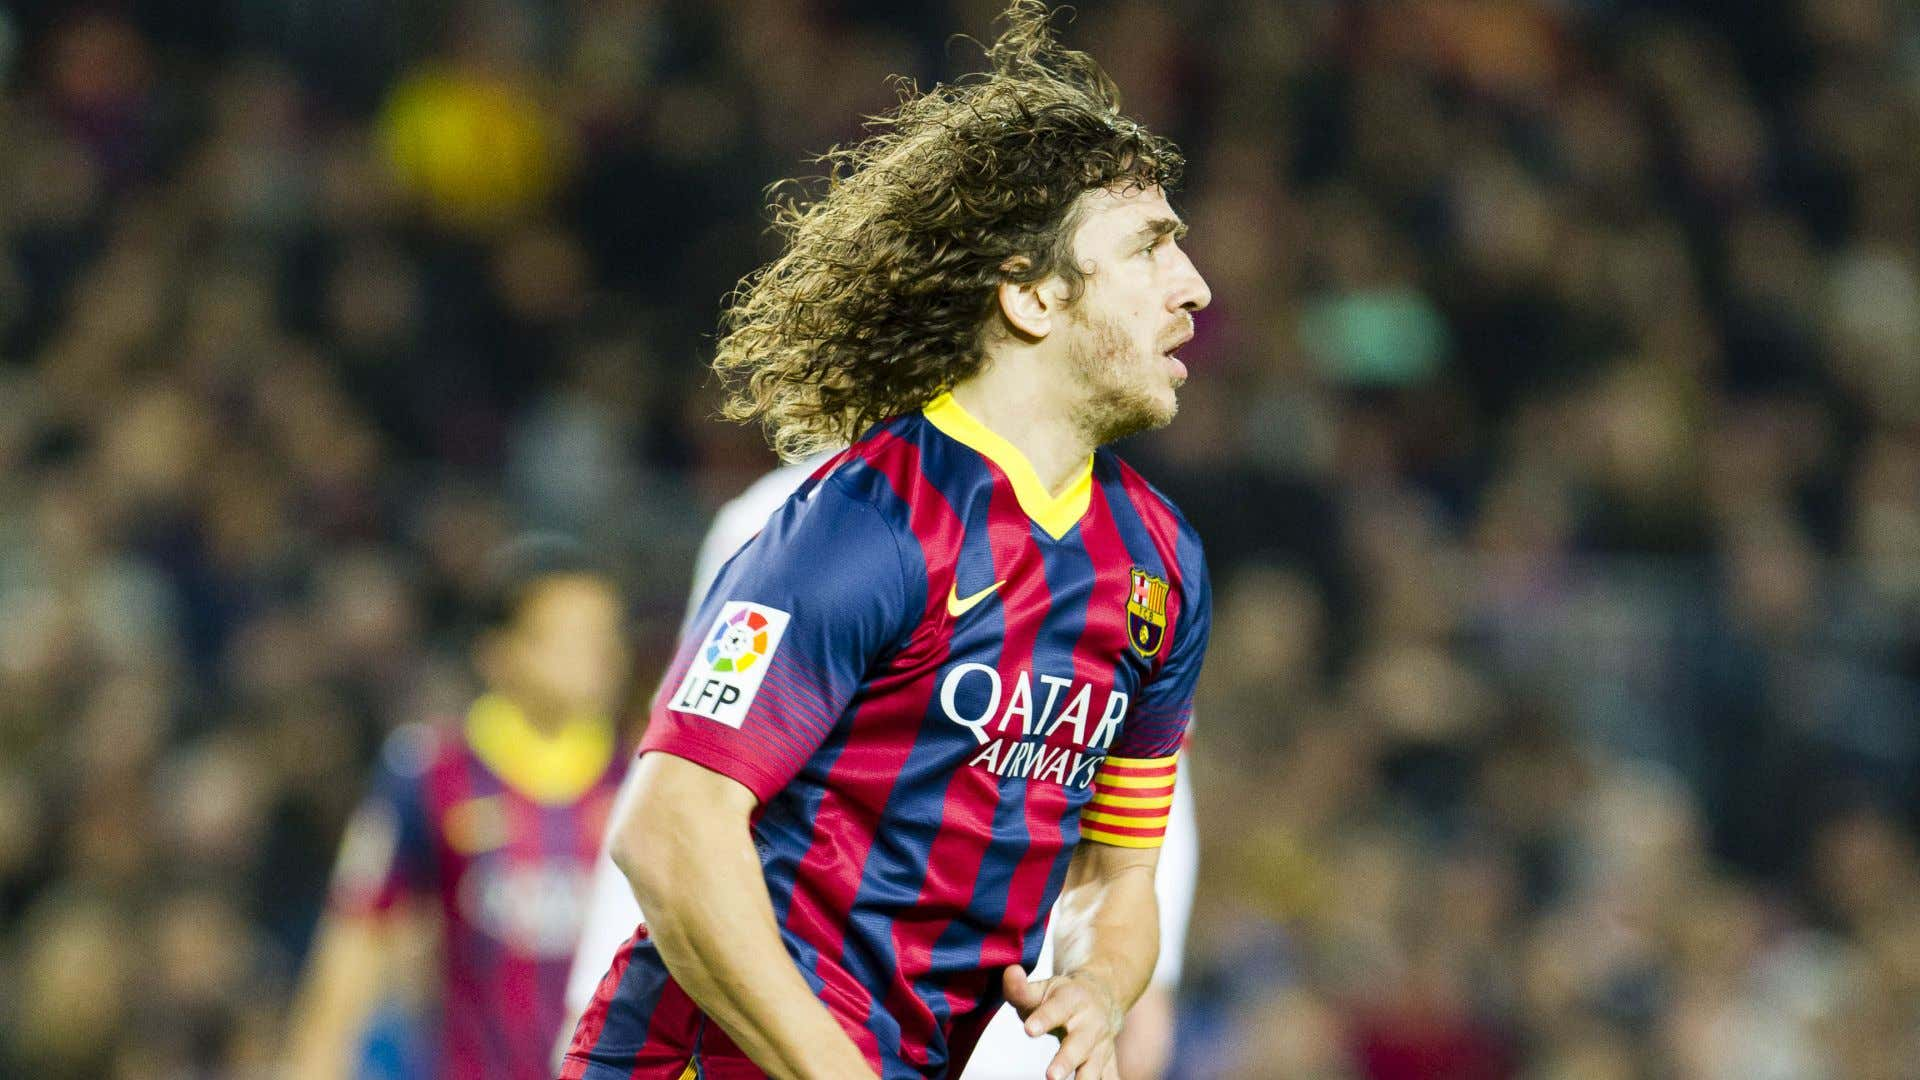 Barça-Real : Carles Puyol désigne son meilleur Clásico | Goal.com